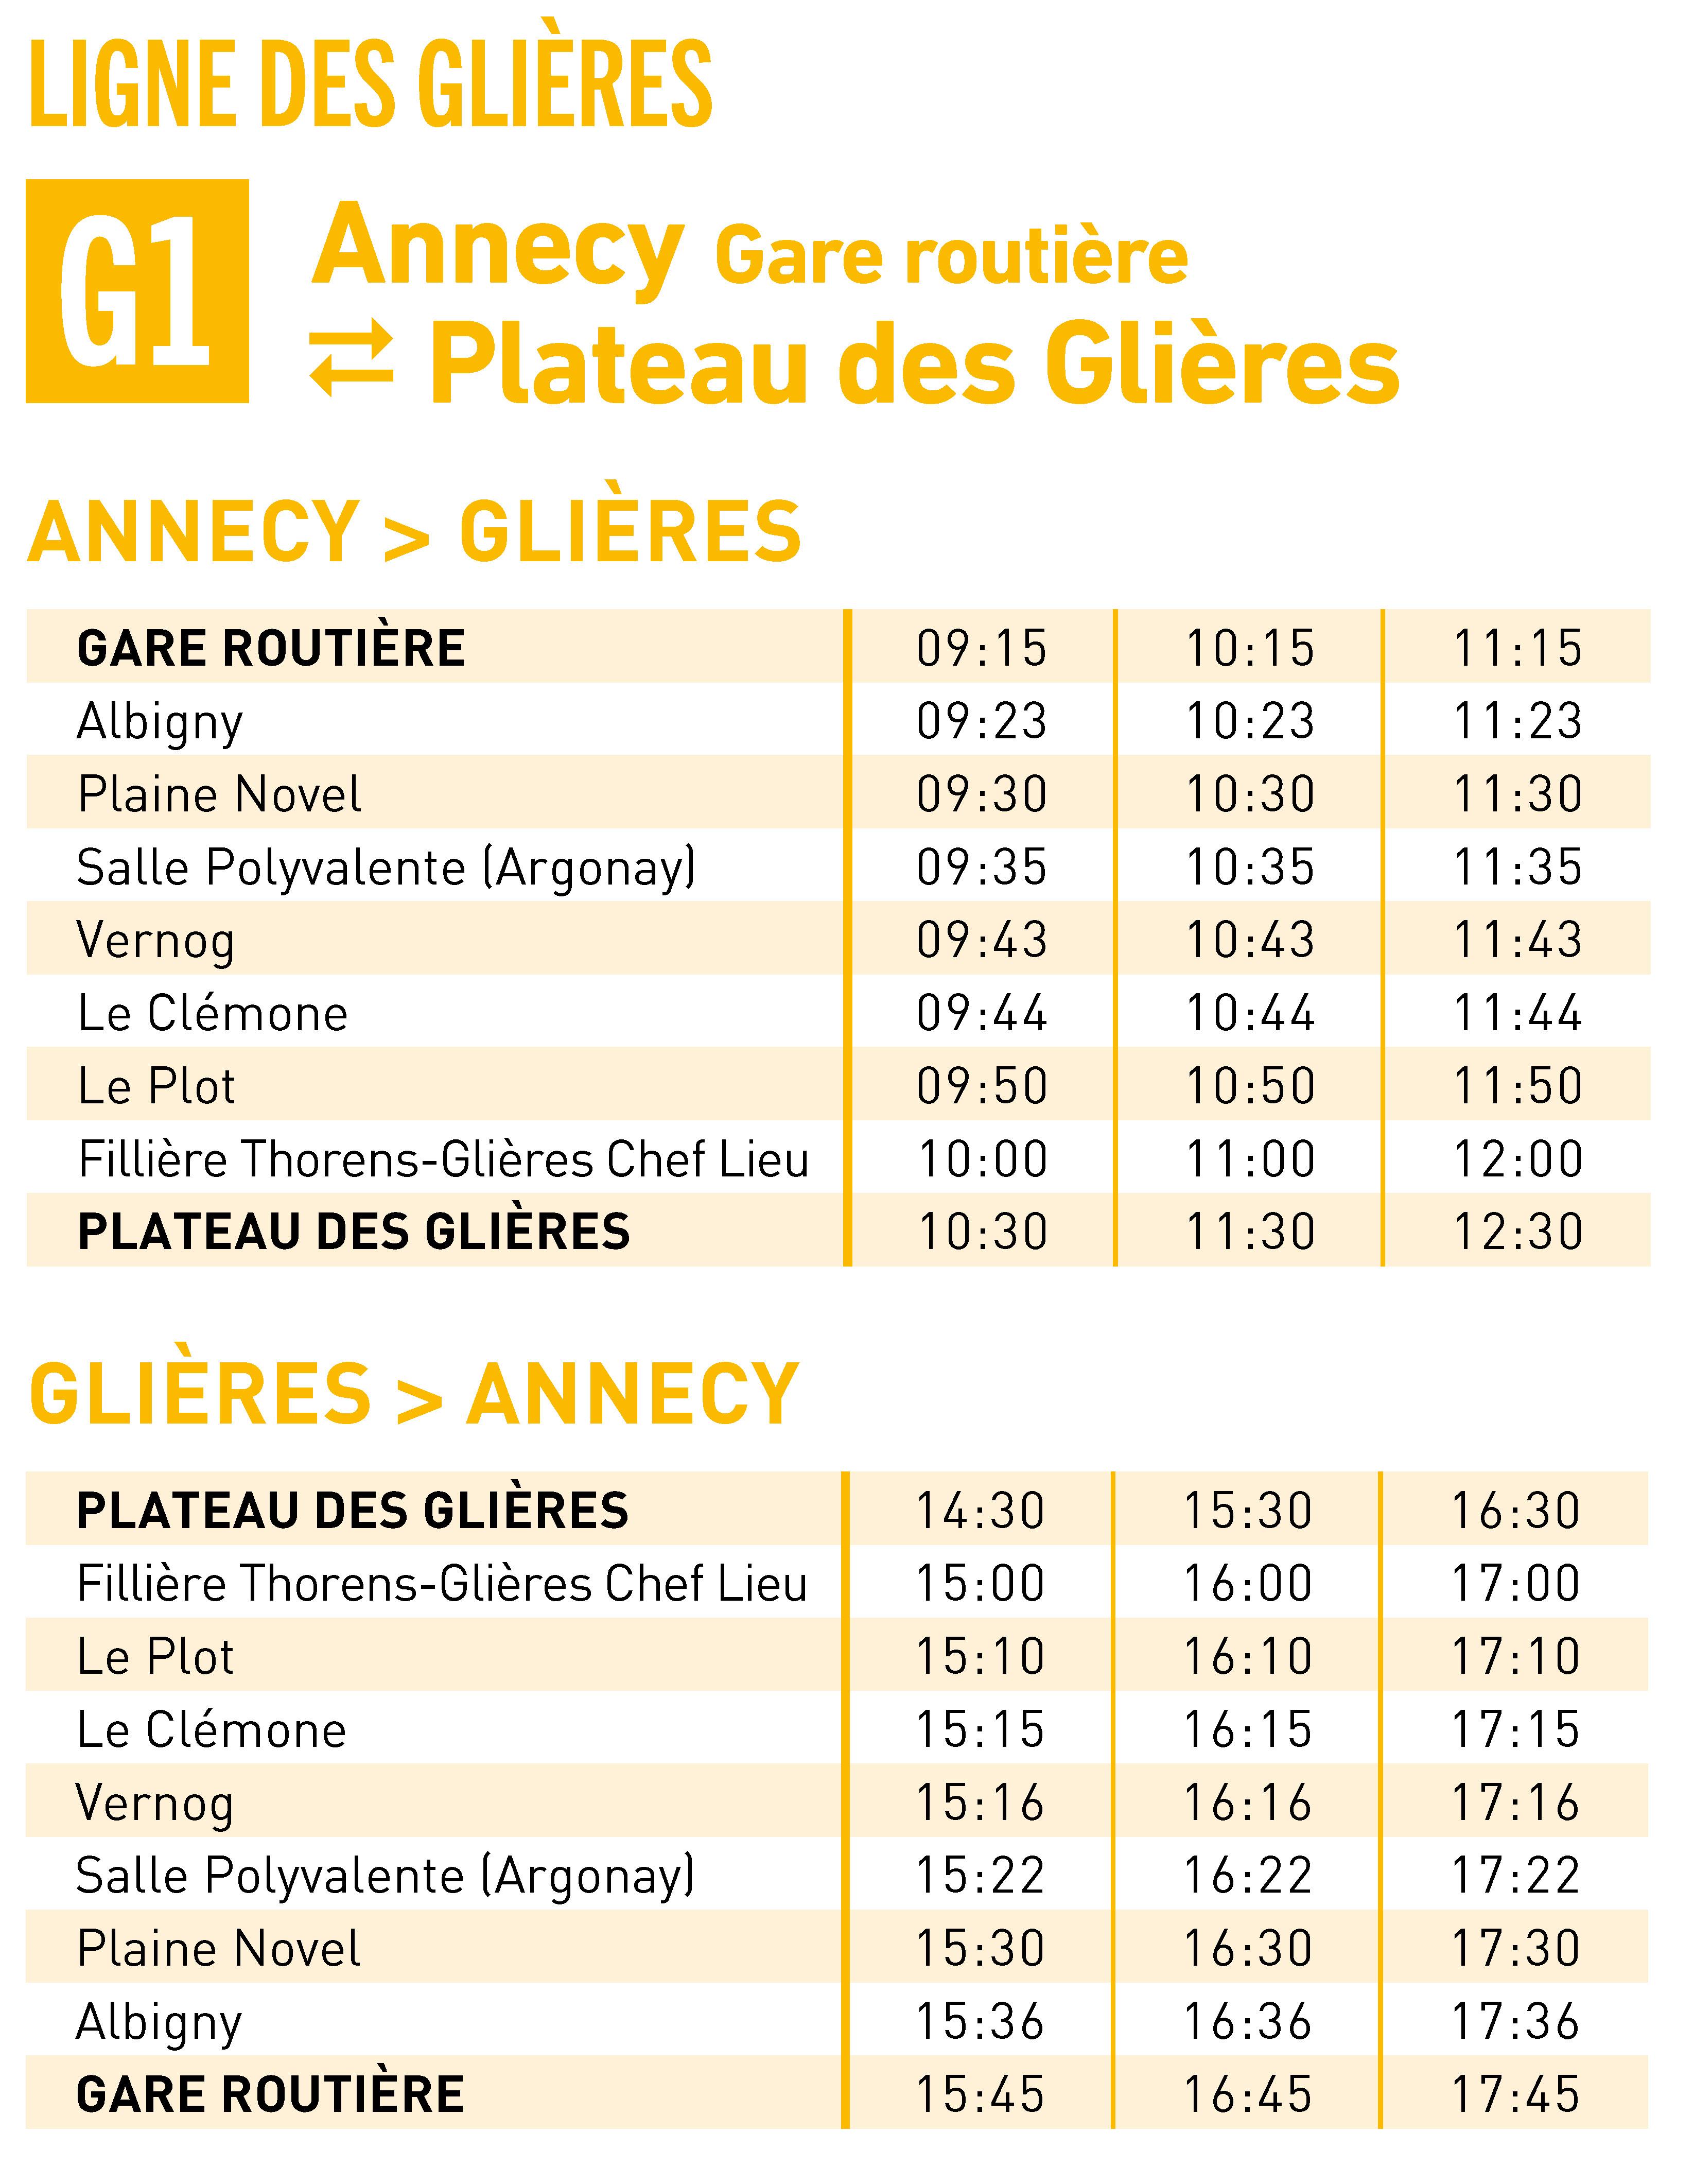 Horaires lignes G1 2020/2021